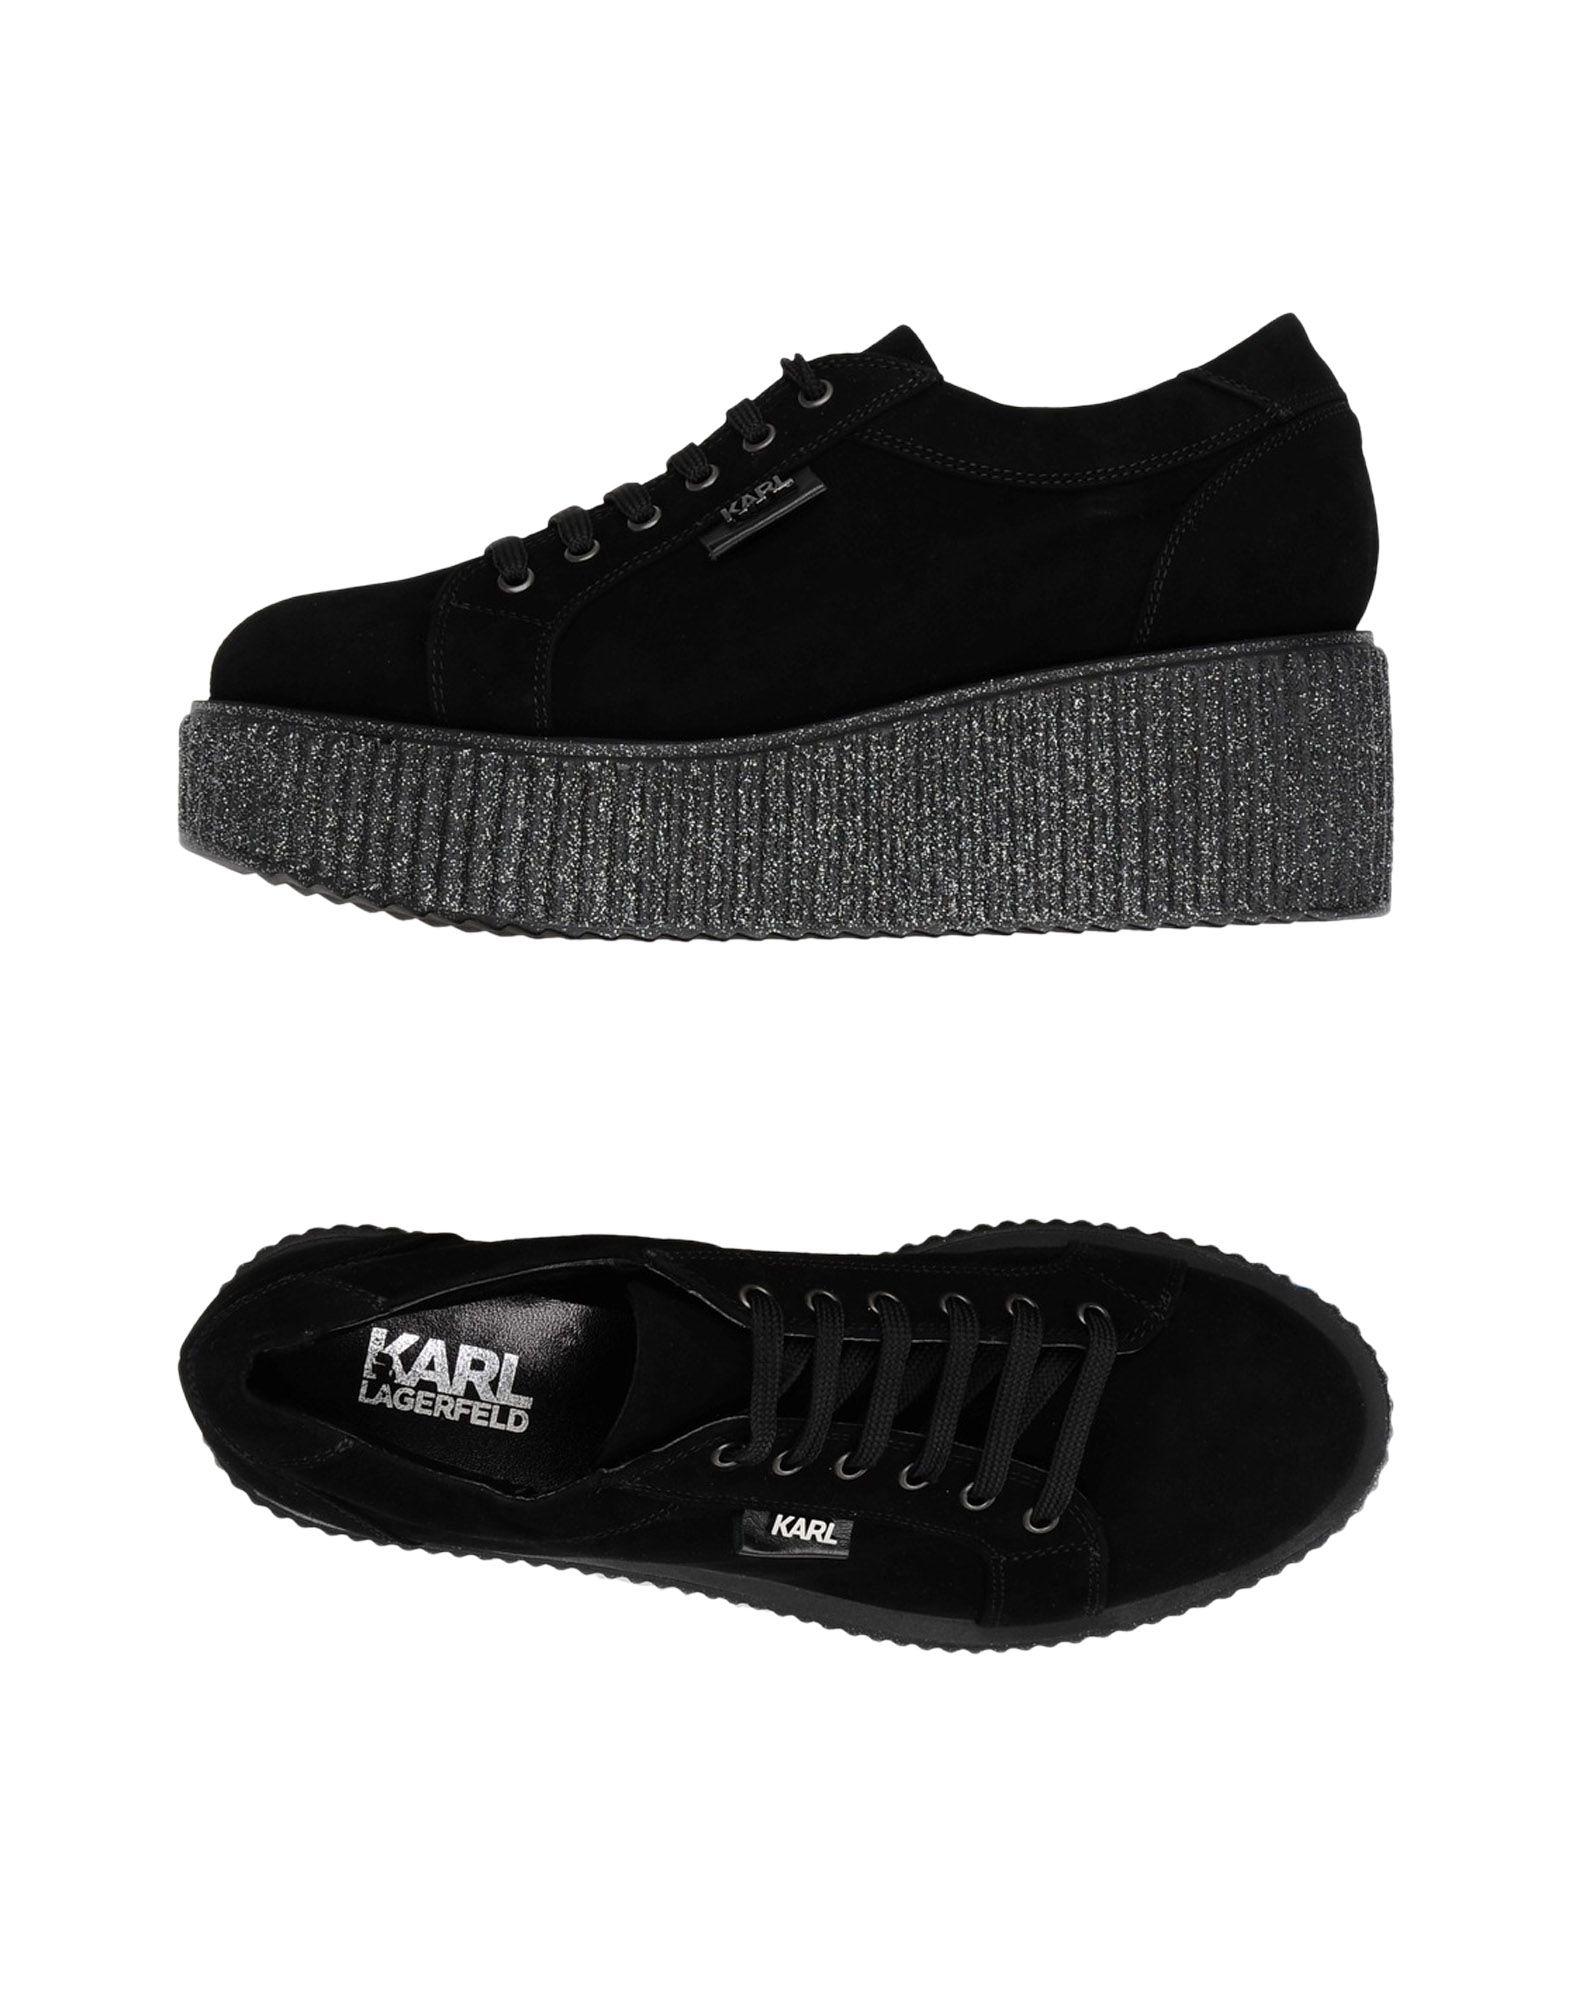 Karl Lagerfeld Kreeper Lace Shoe Suede  11423963NNGut aussehende strapazierfähige Schuhe